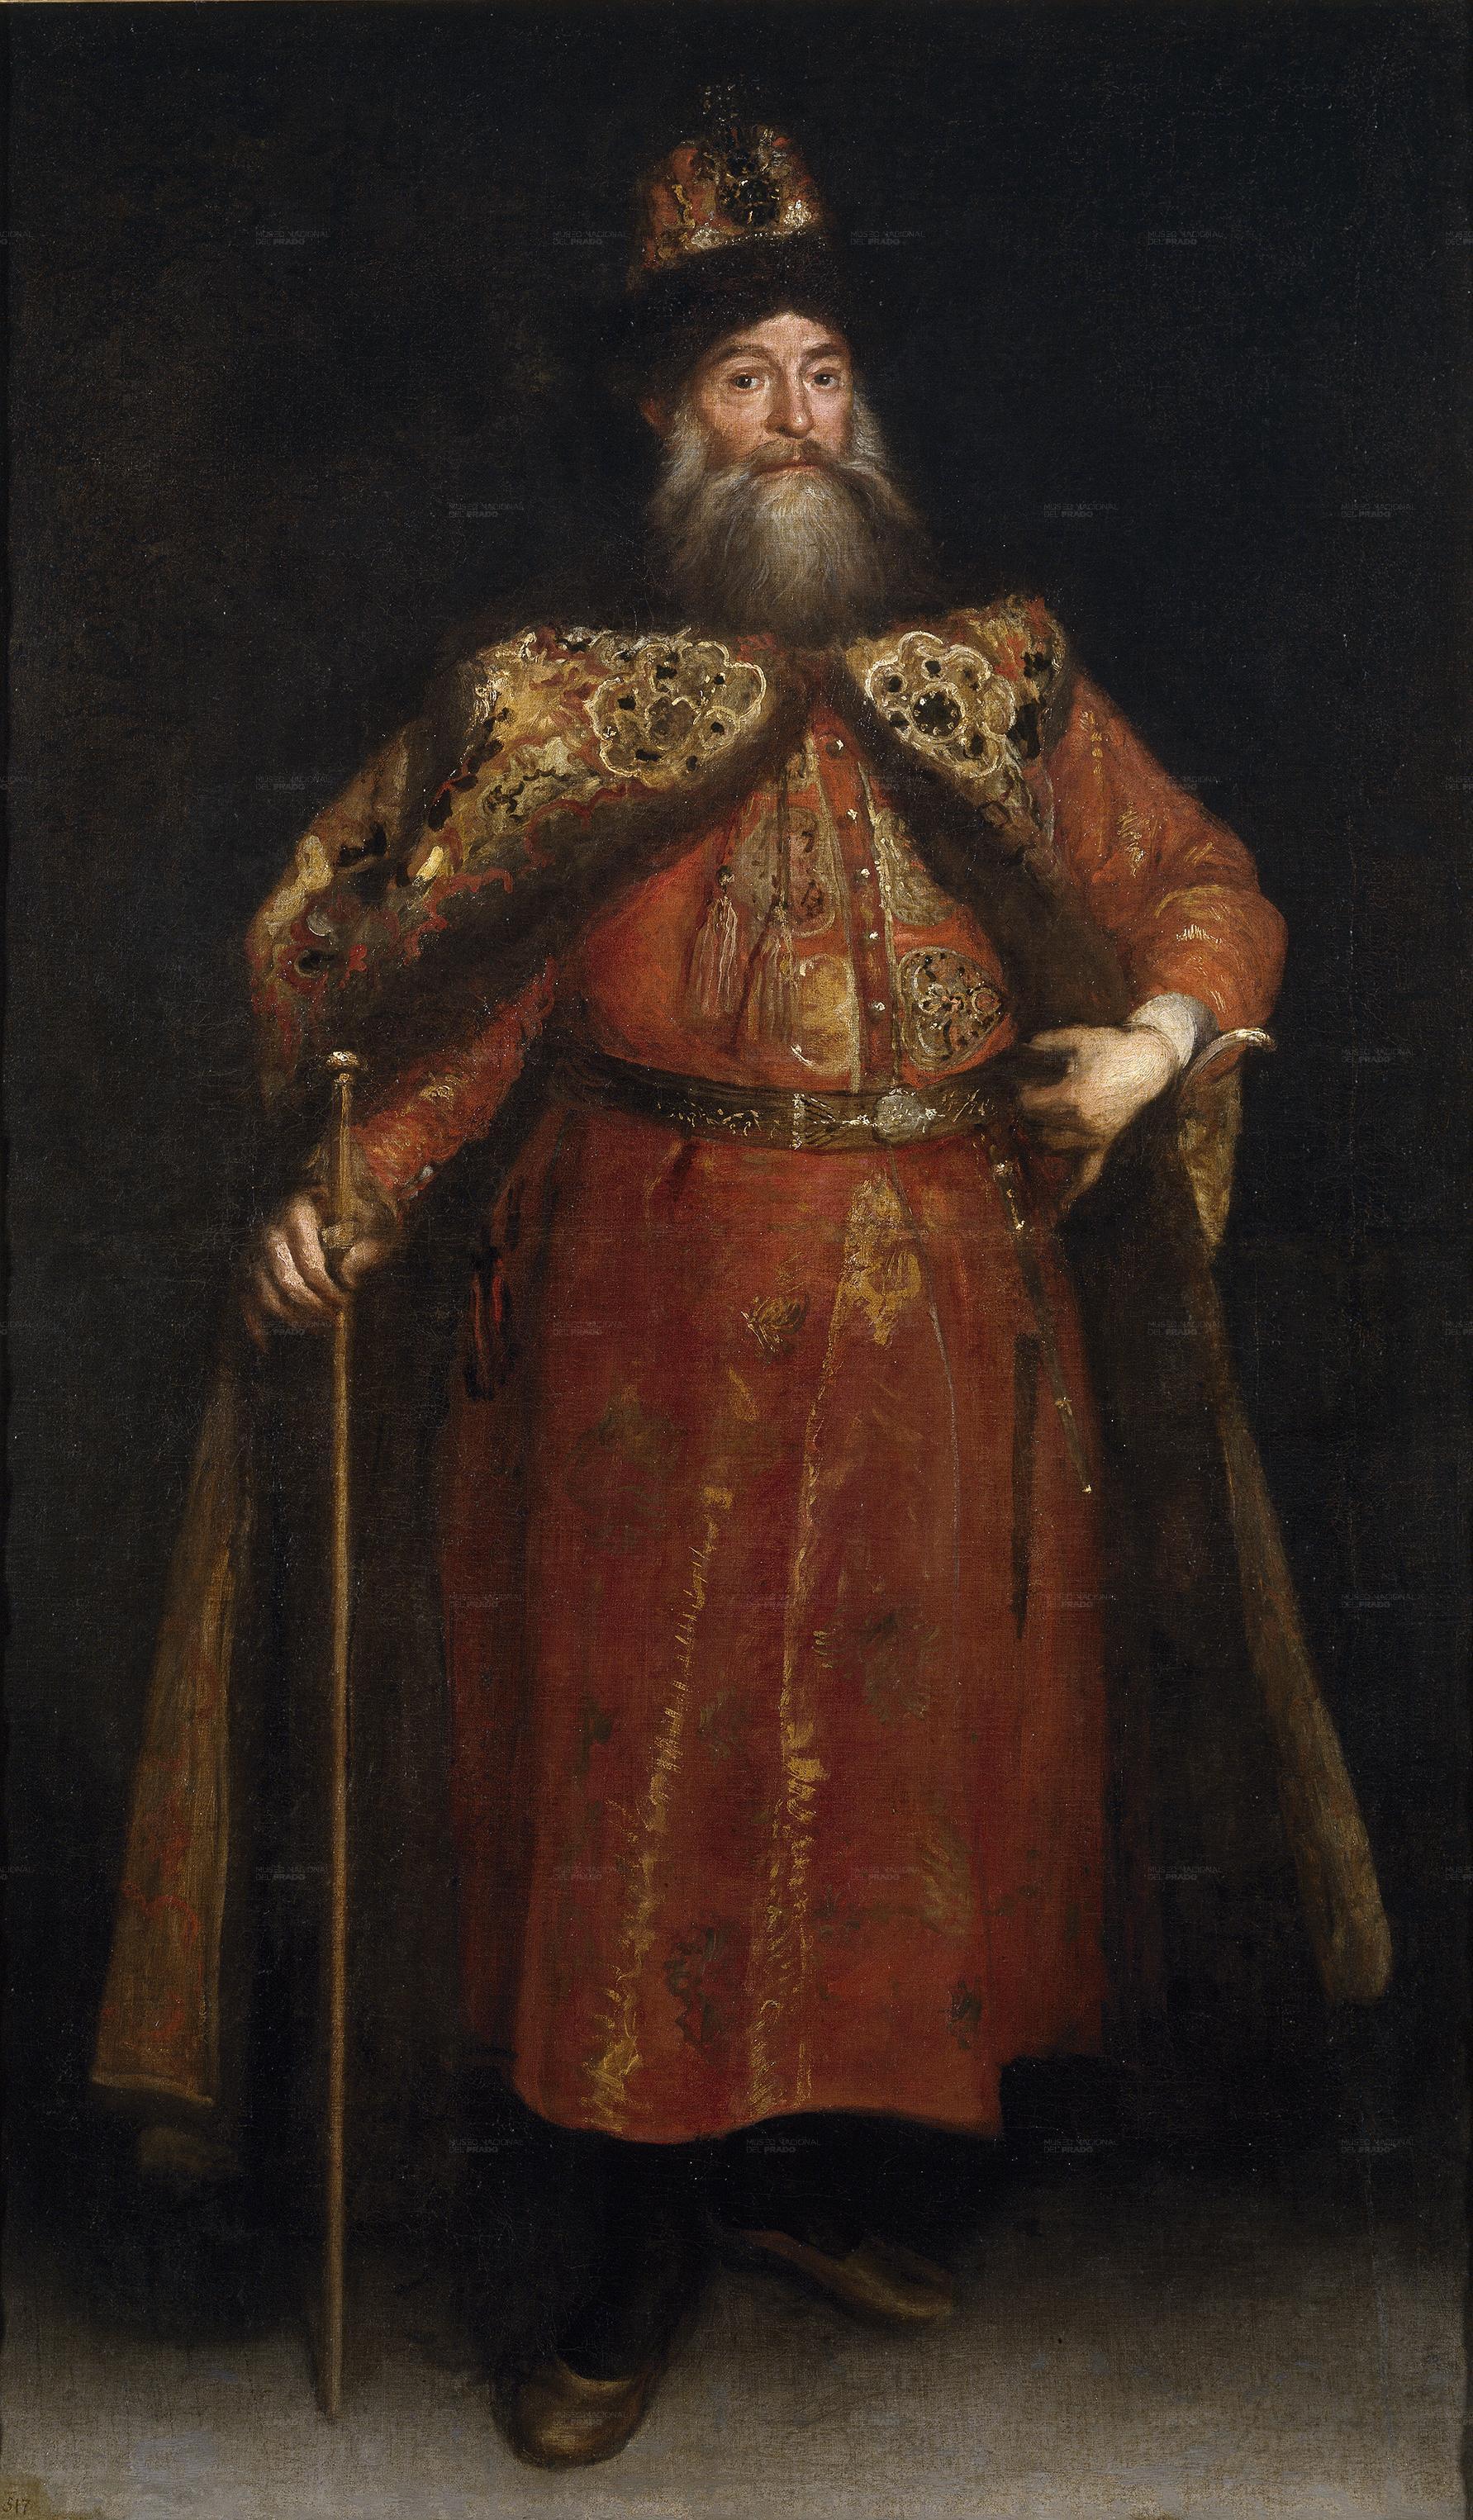 Piotr Potiomkin